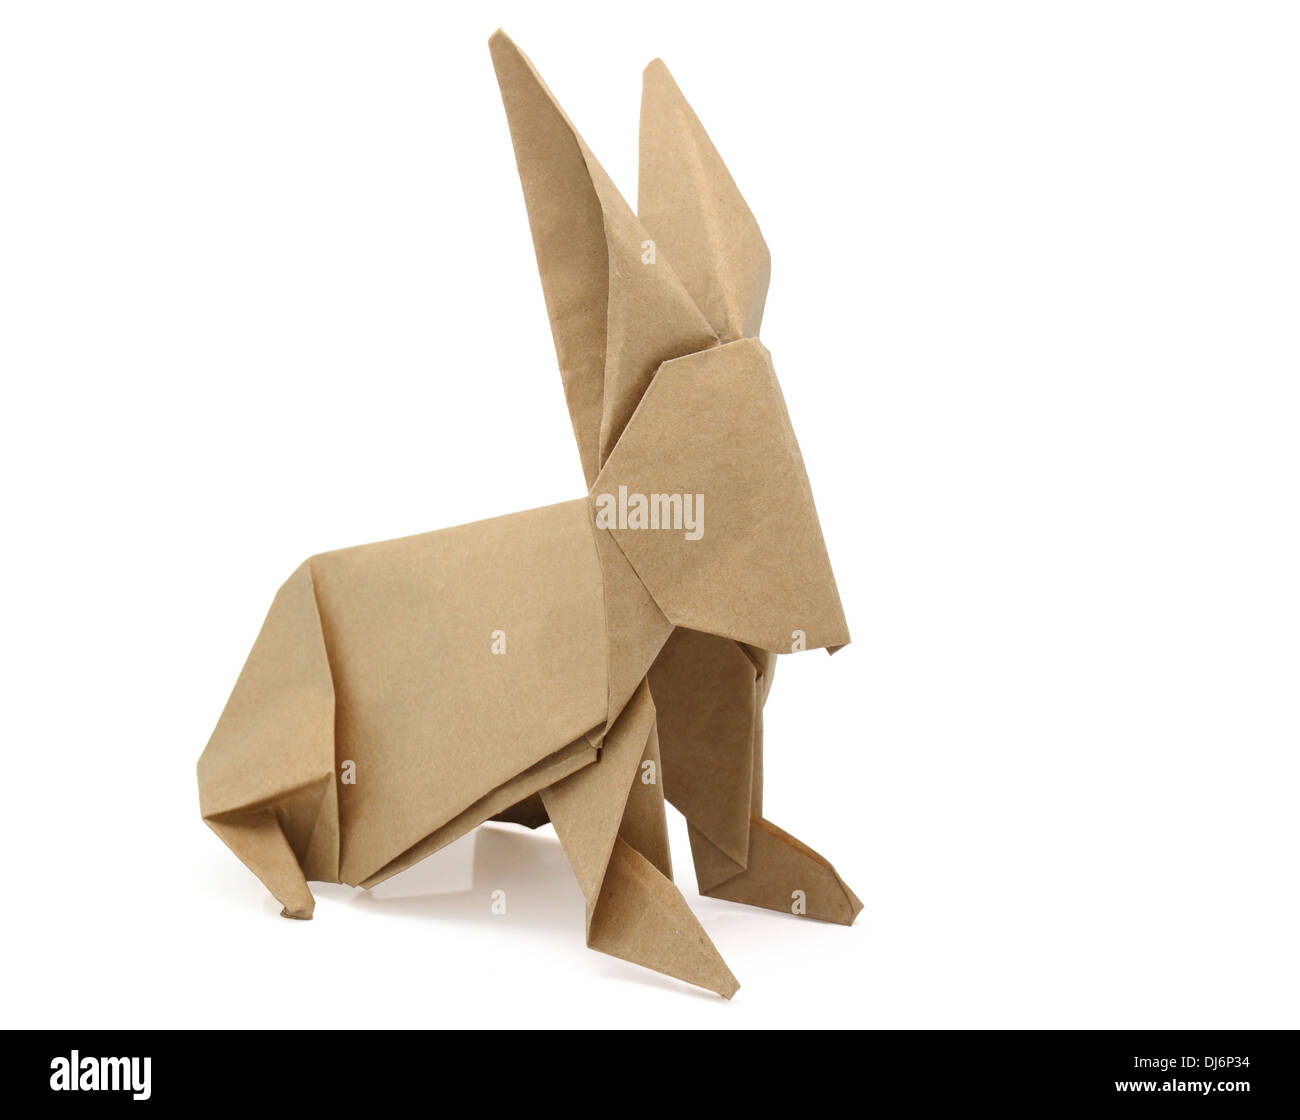 Origami-Kaninchen aus Recyclingpapier Stockbild